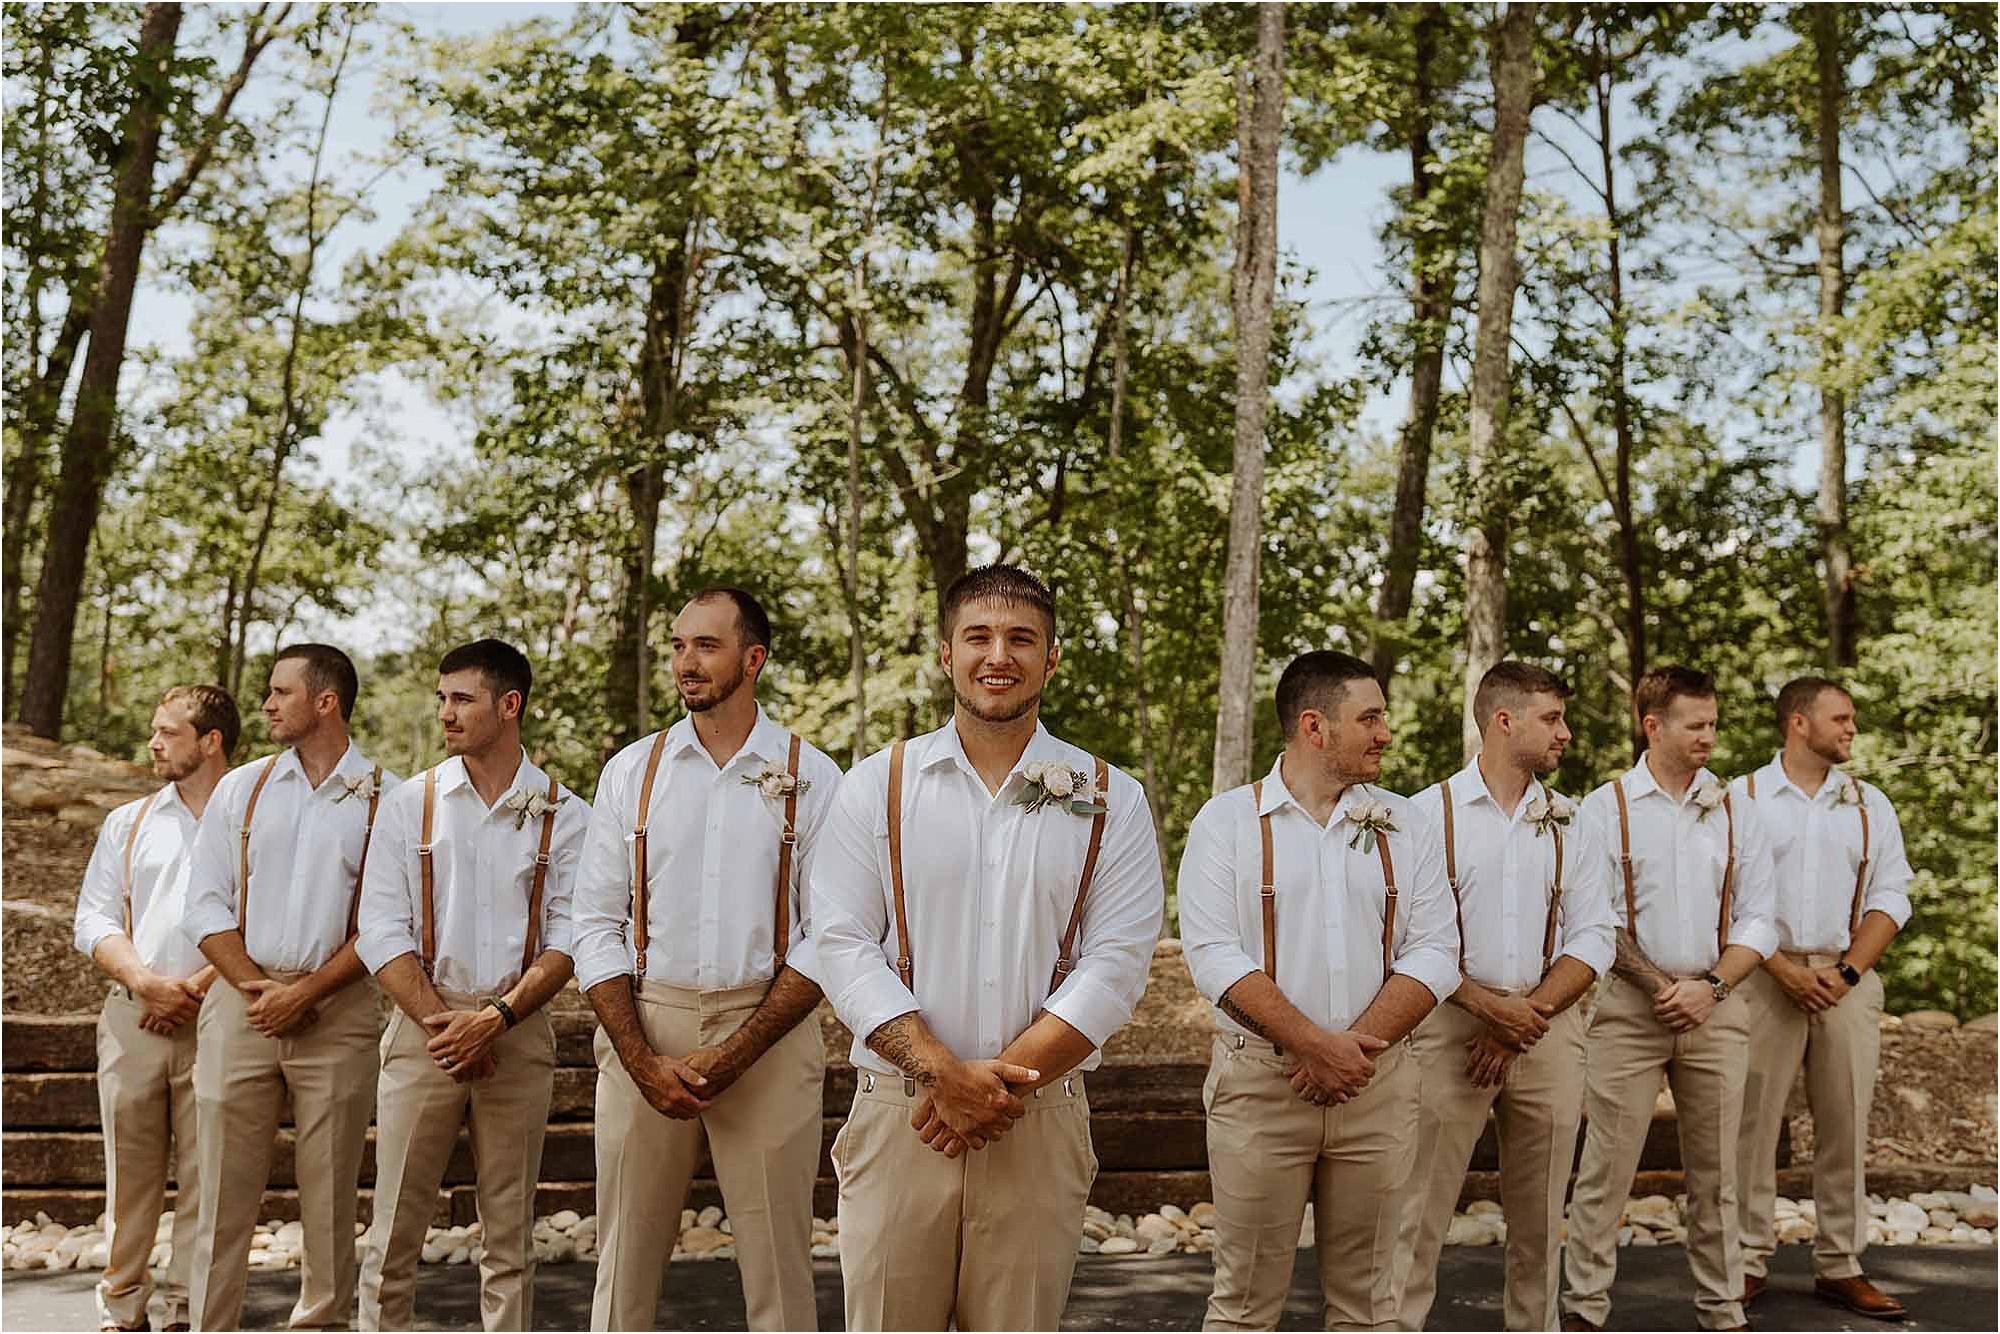 groom and groomsmen photo in woods